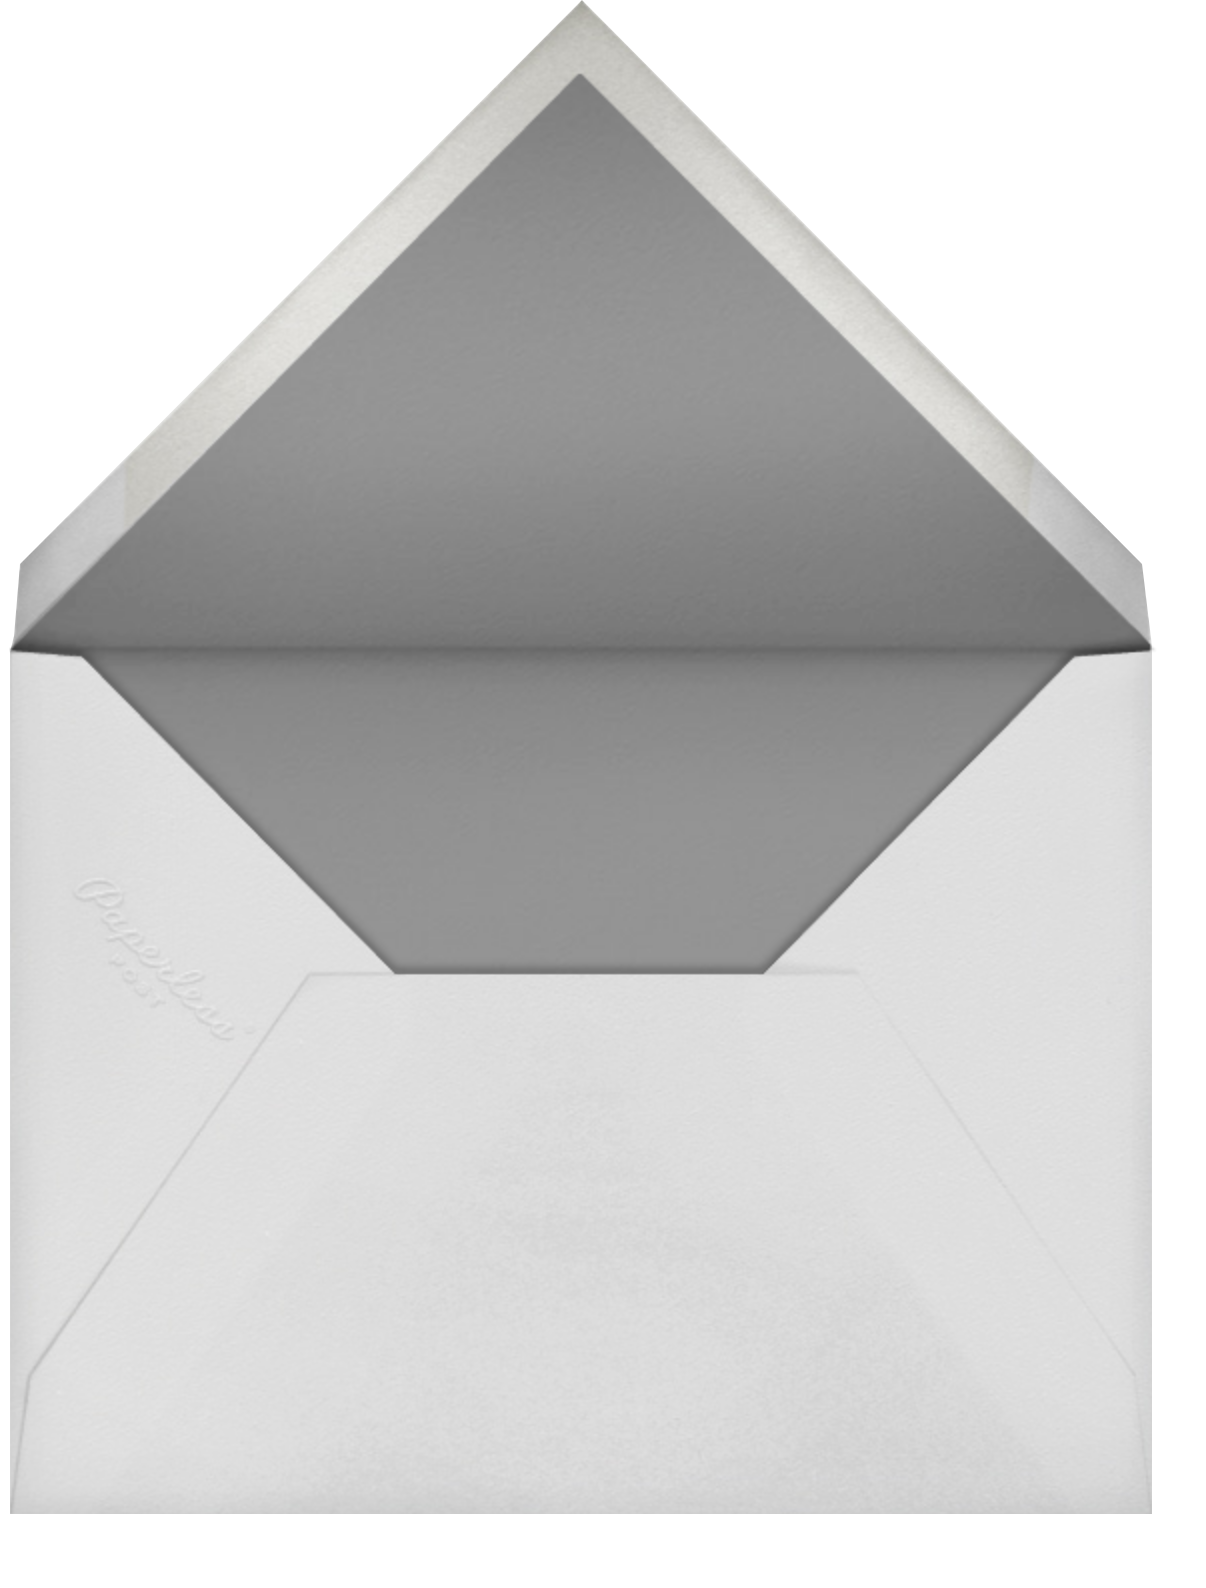 Custom Foil (Square) - Rose Gold - Paperless Post - Adult birthday - envelope back